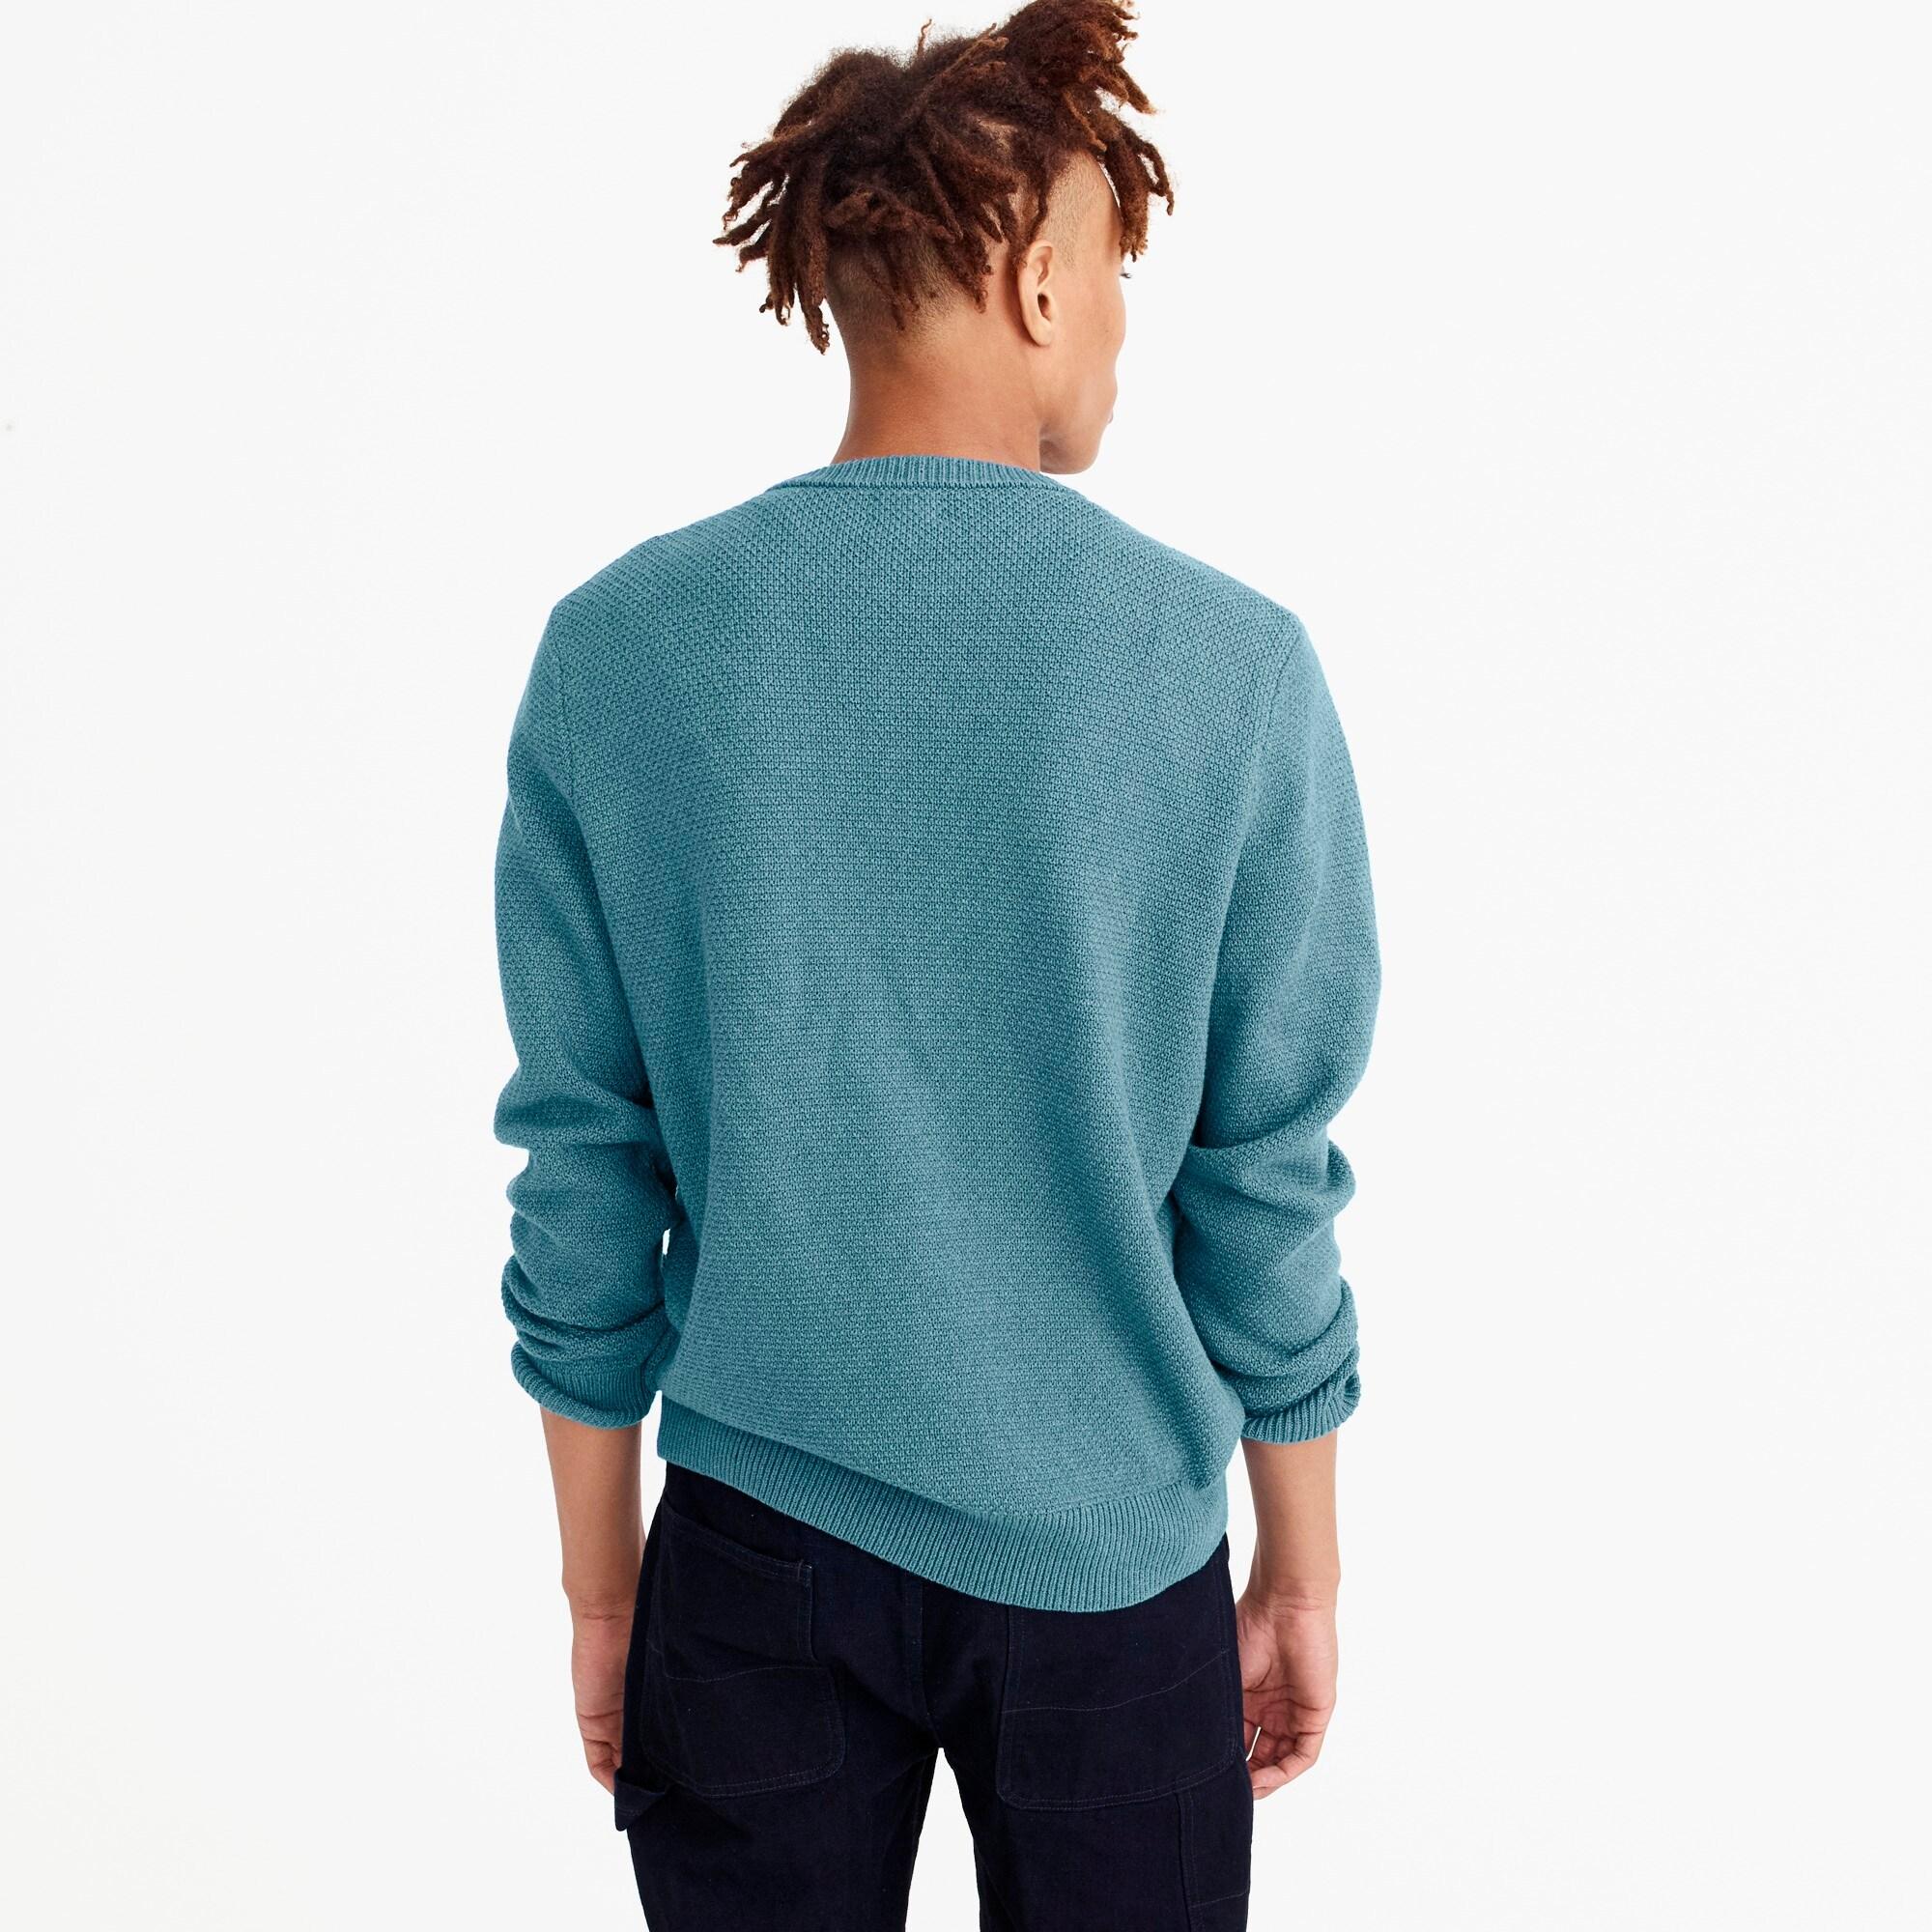 Cotton crewneck sweater in moss stitch